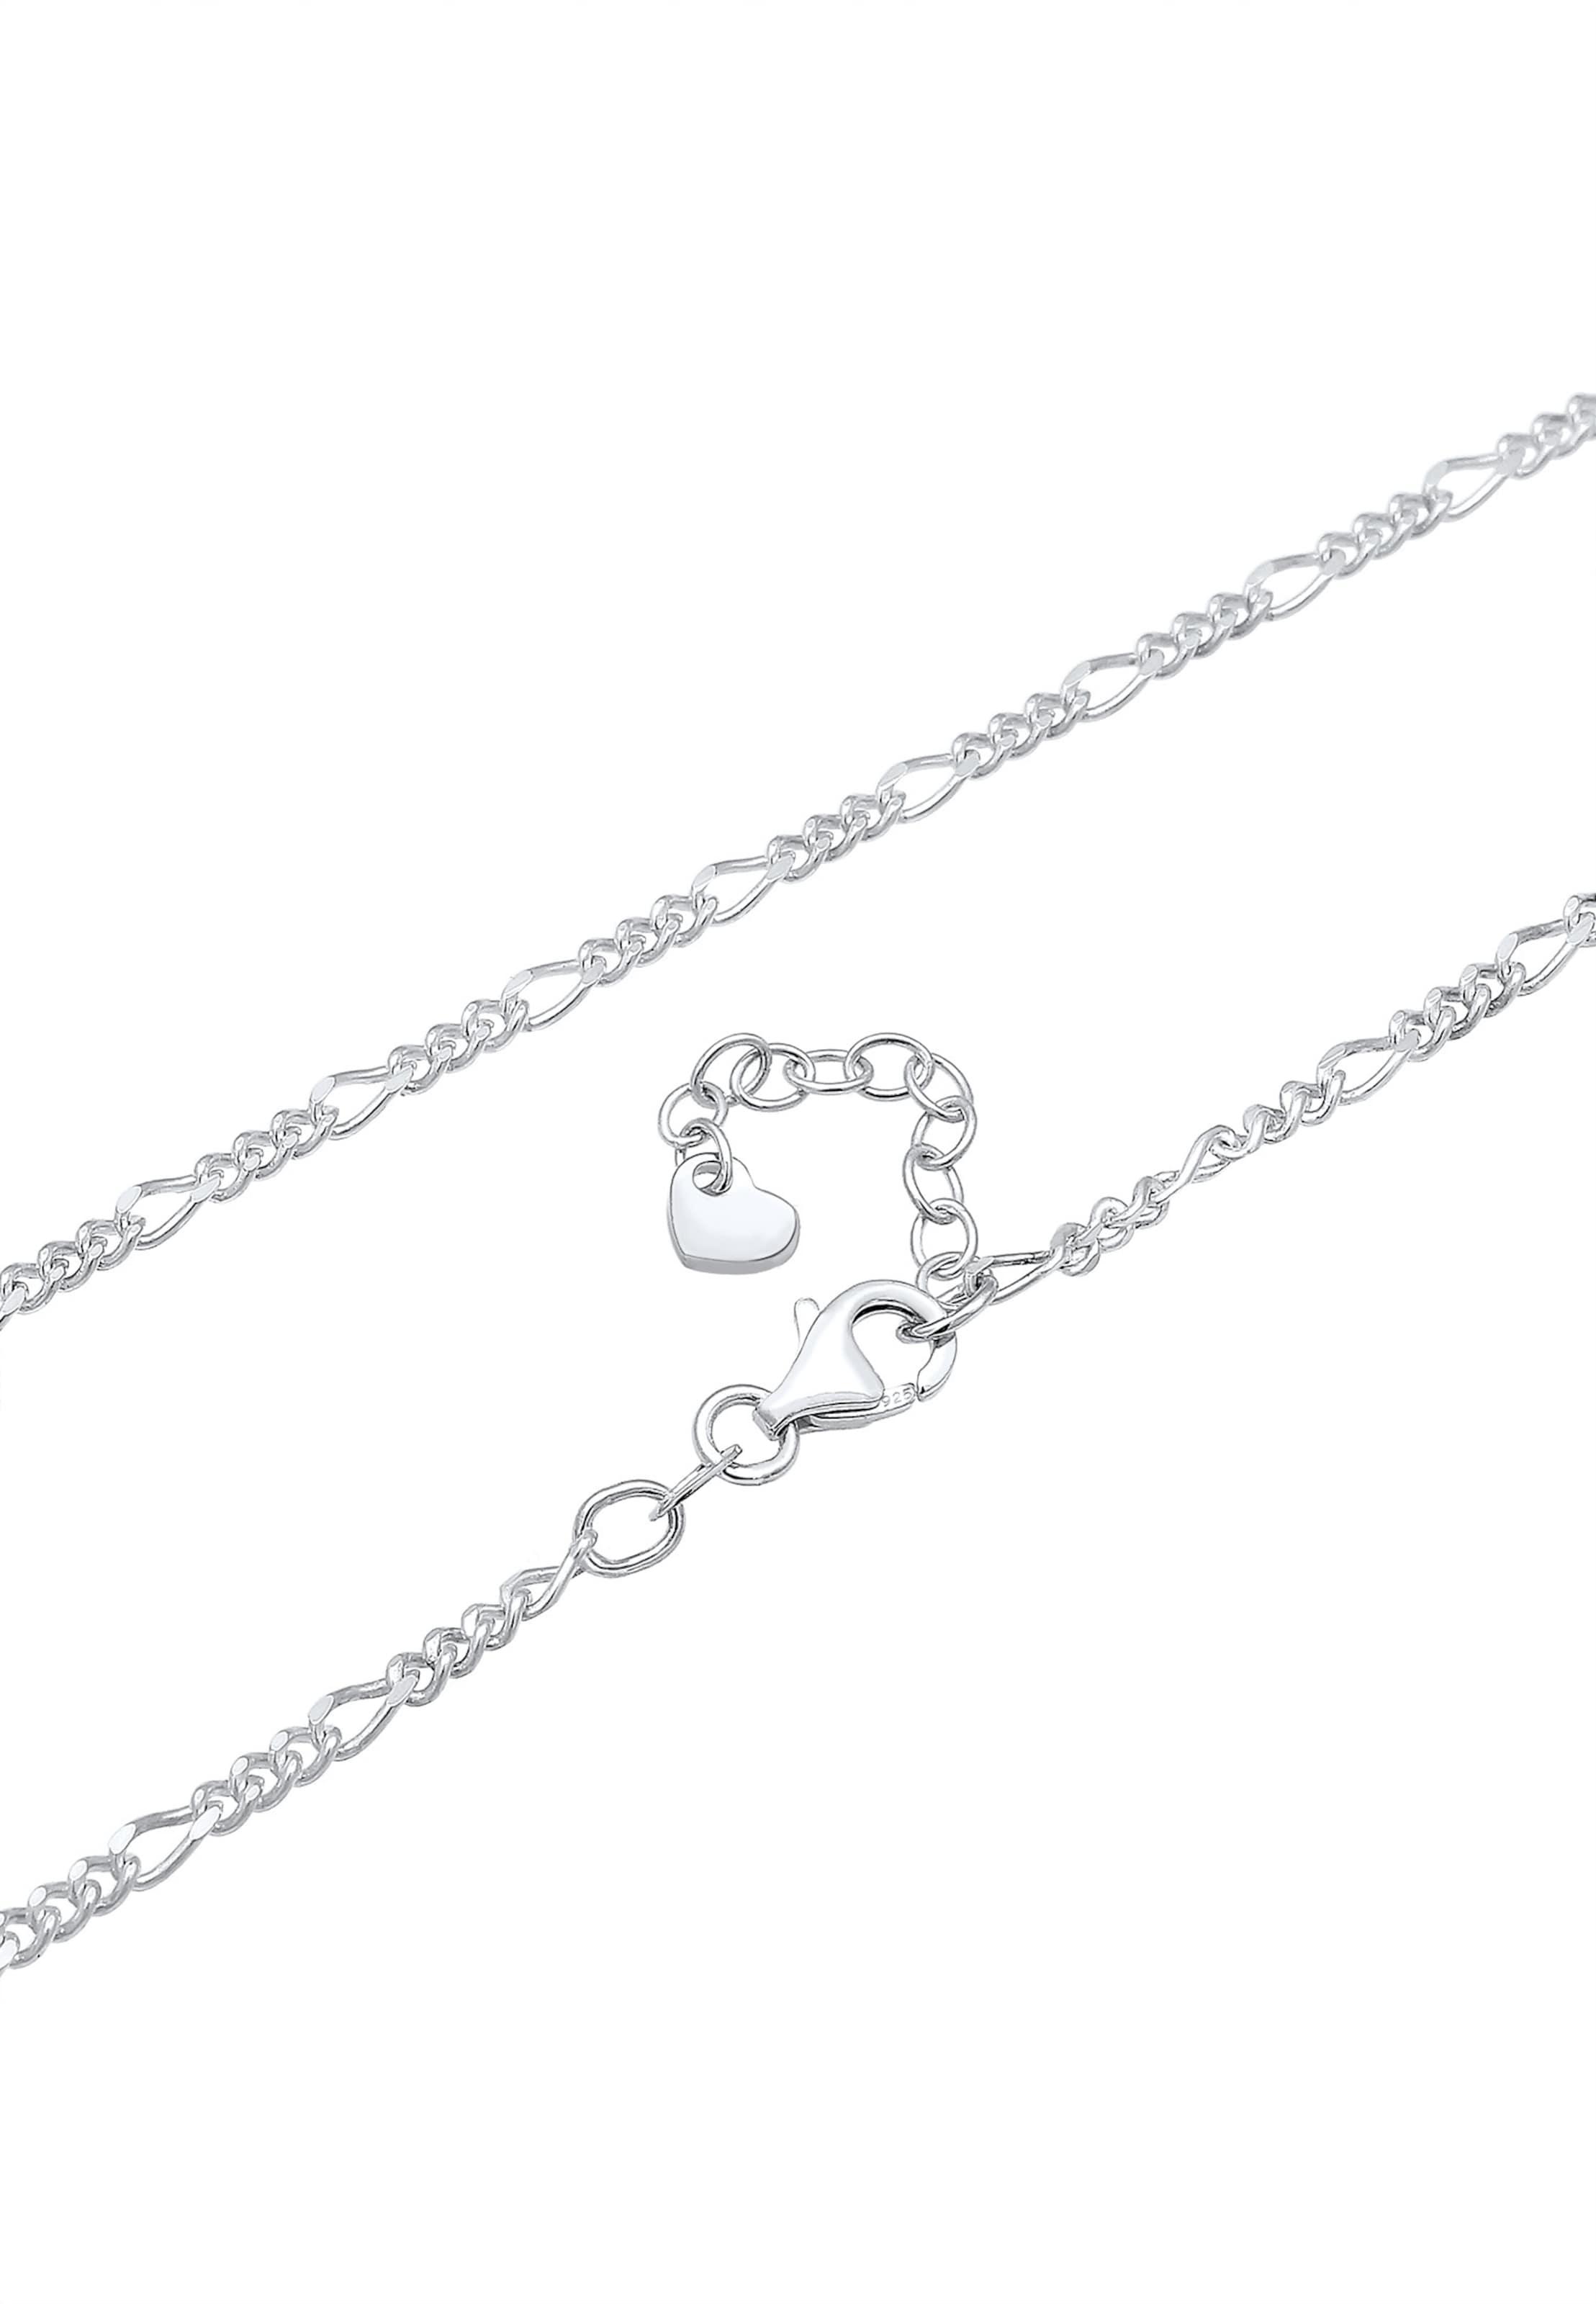 In Halskette Elli Elli Elli In Silber Halskette 'kreuz' 'kreuz' In 'kreuz' Silber Halskette SzpqVGUM